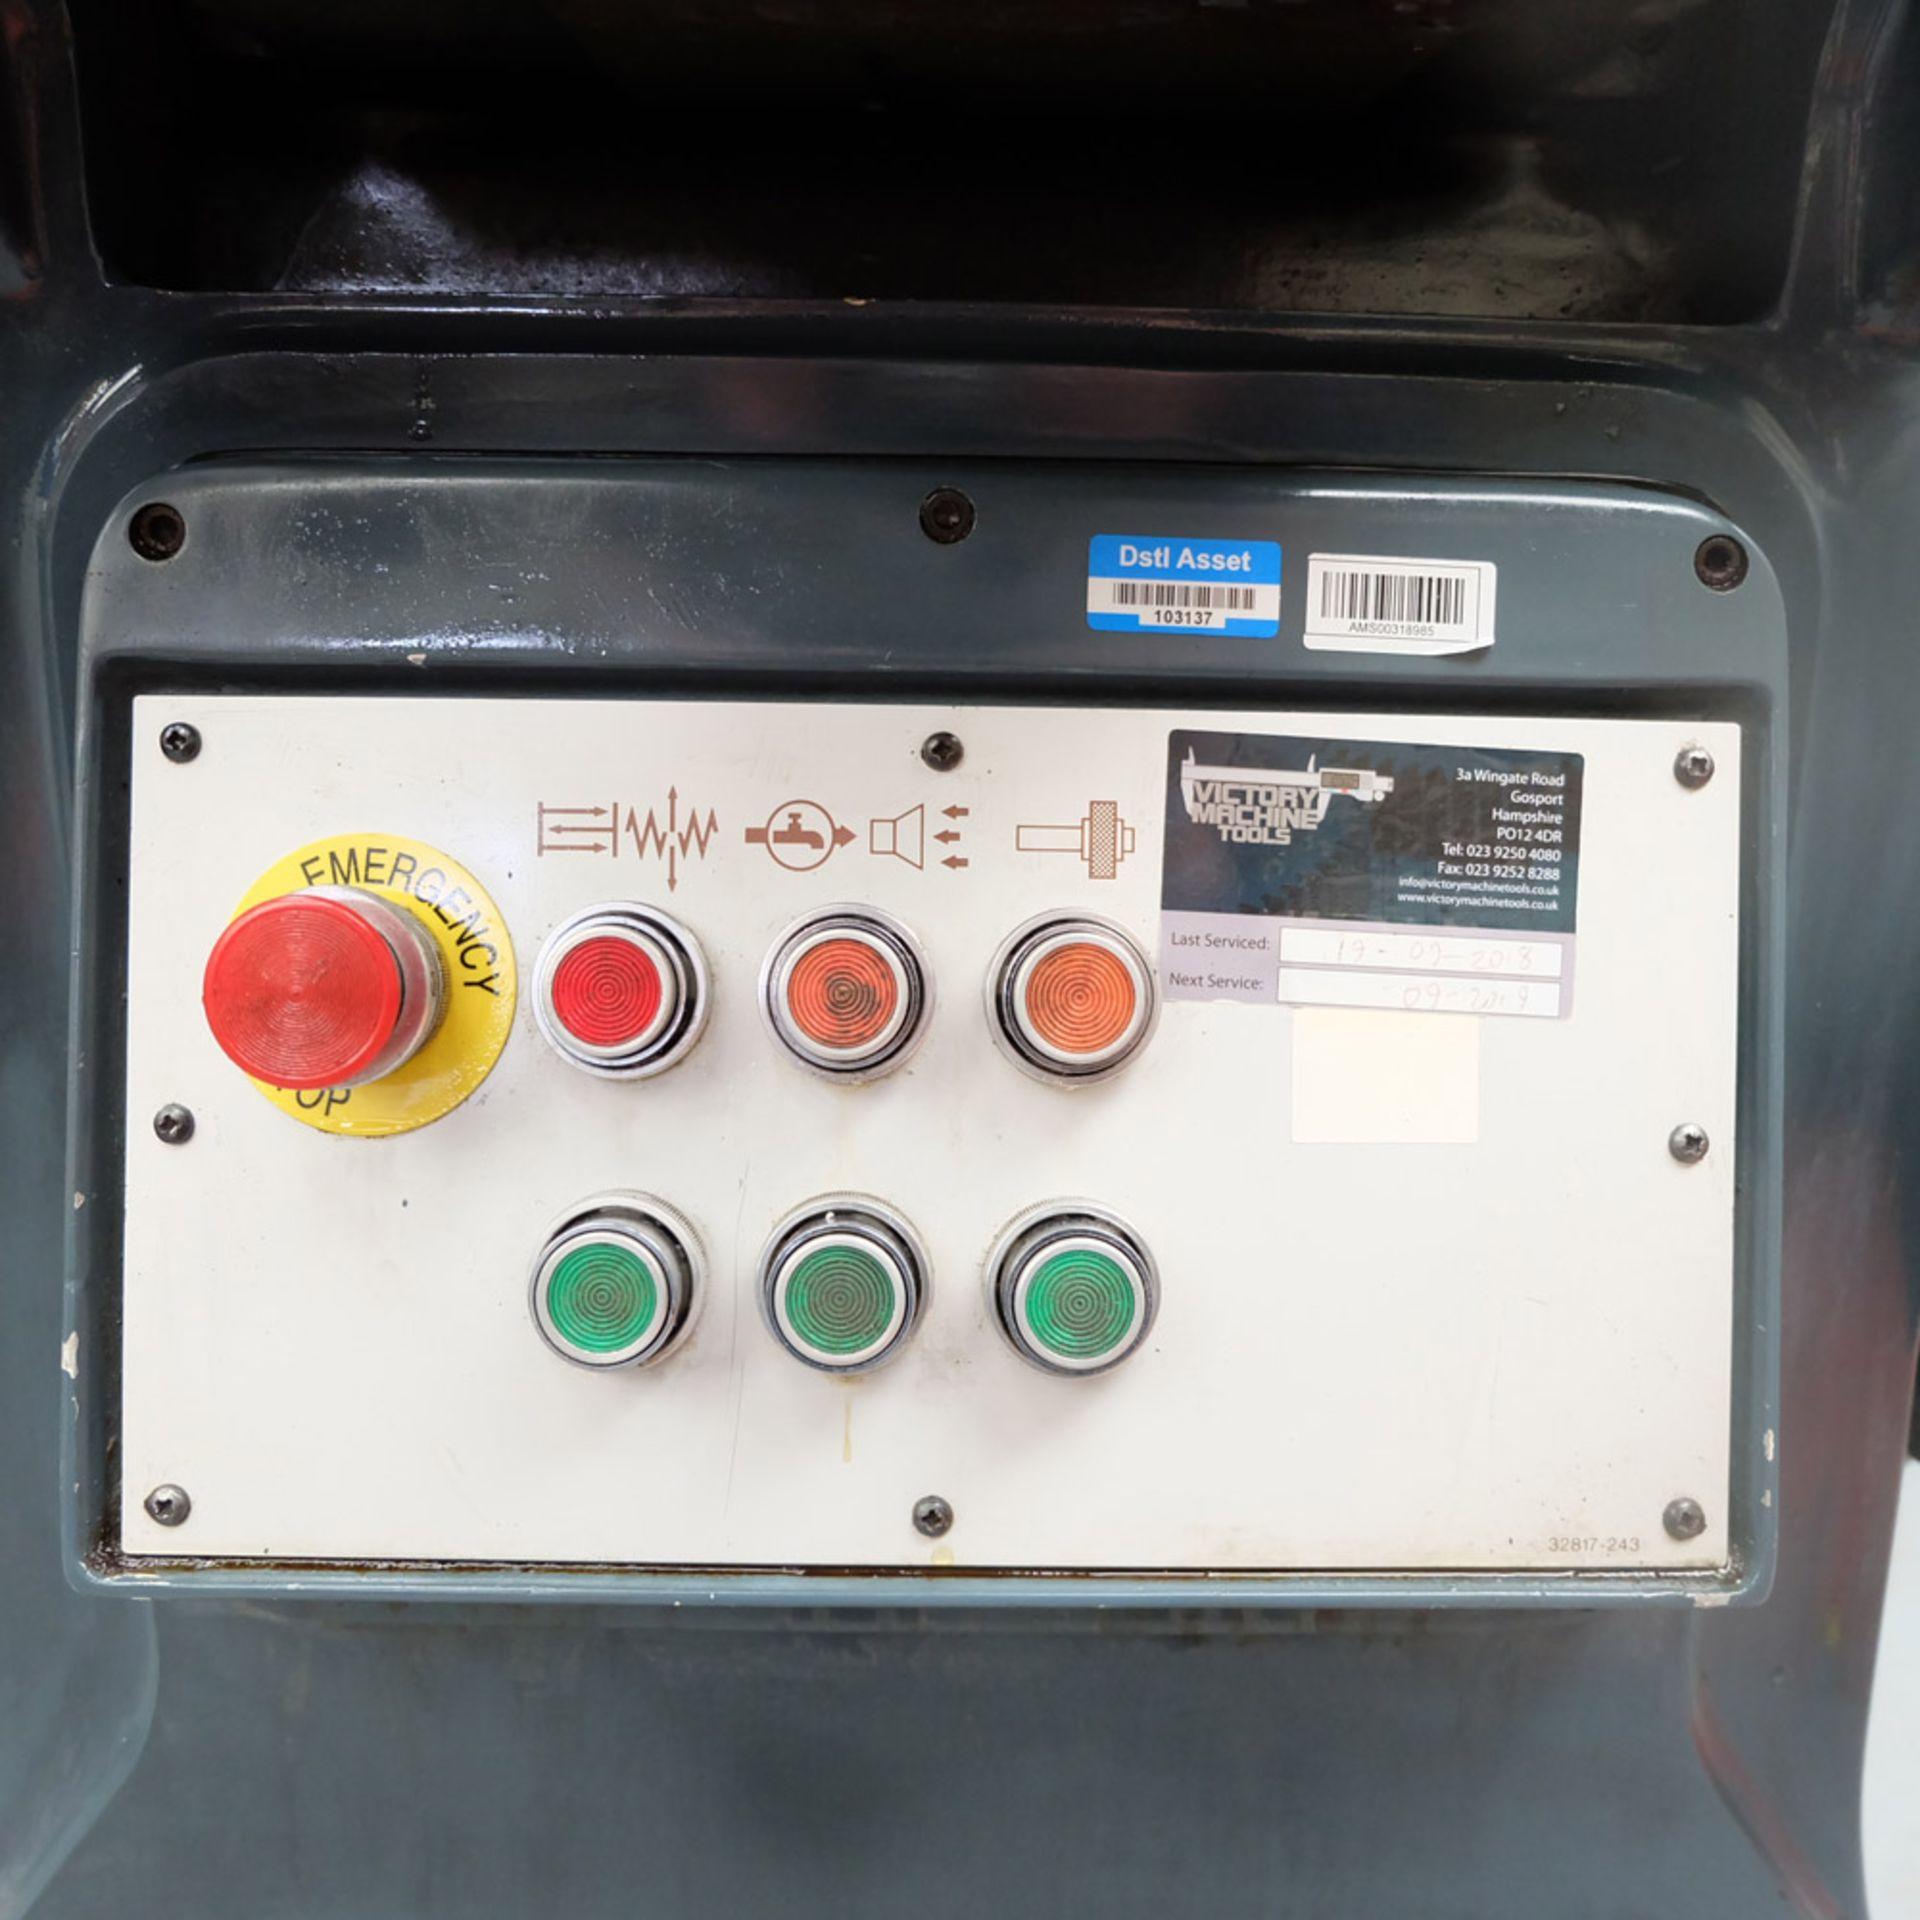 "Jones & Shipman 540P Tool Room Surface Grinder. Capacity 18"" x 6"". - Image 4 of 7"